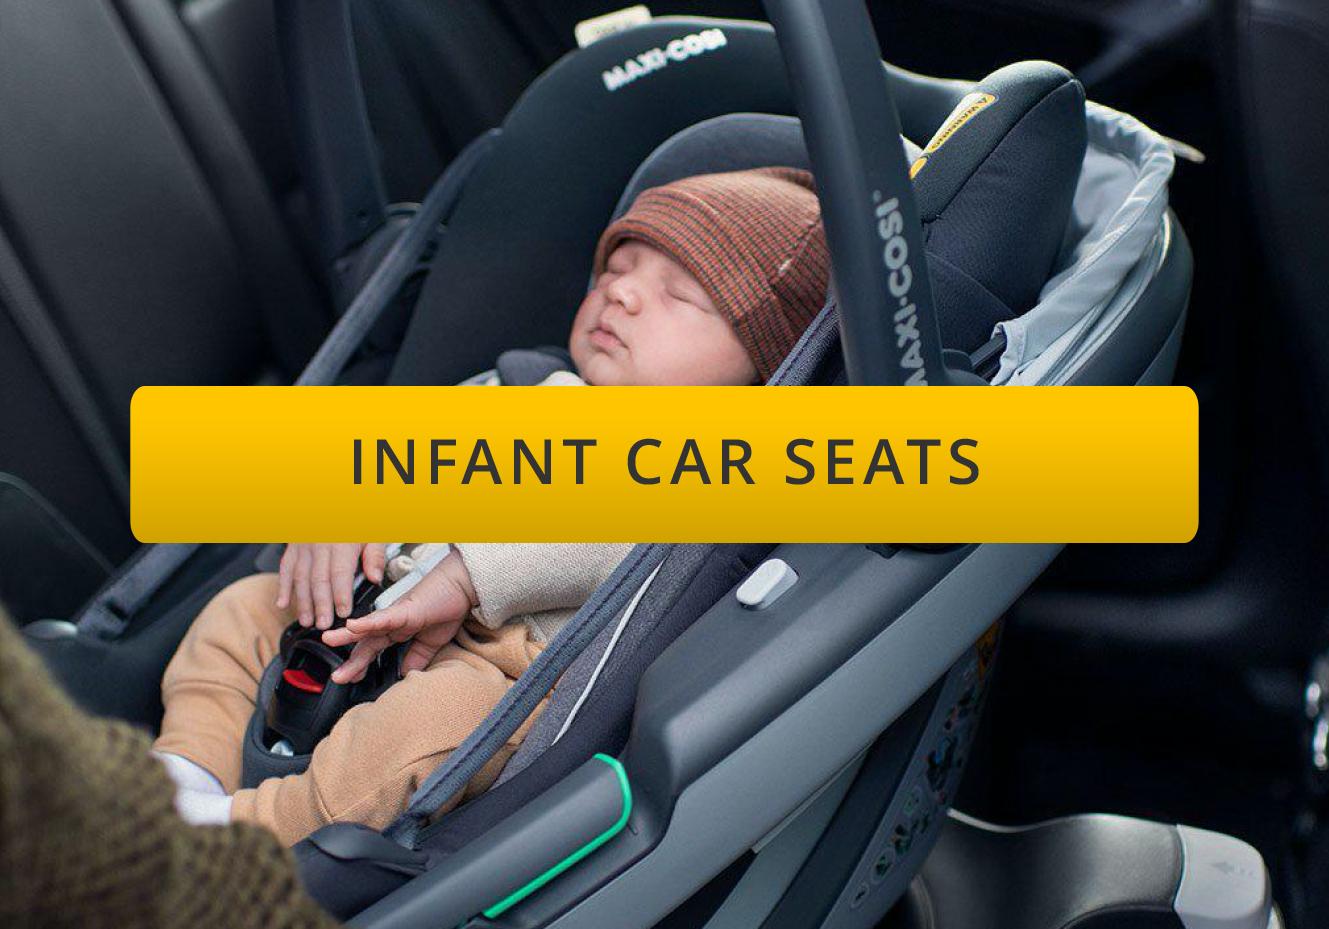 Maxi Cosi baby car seats